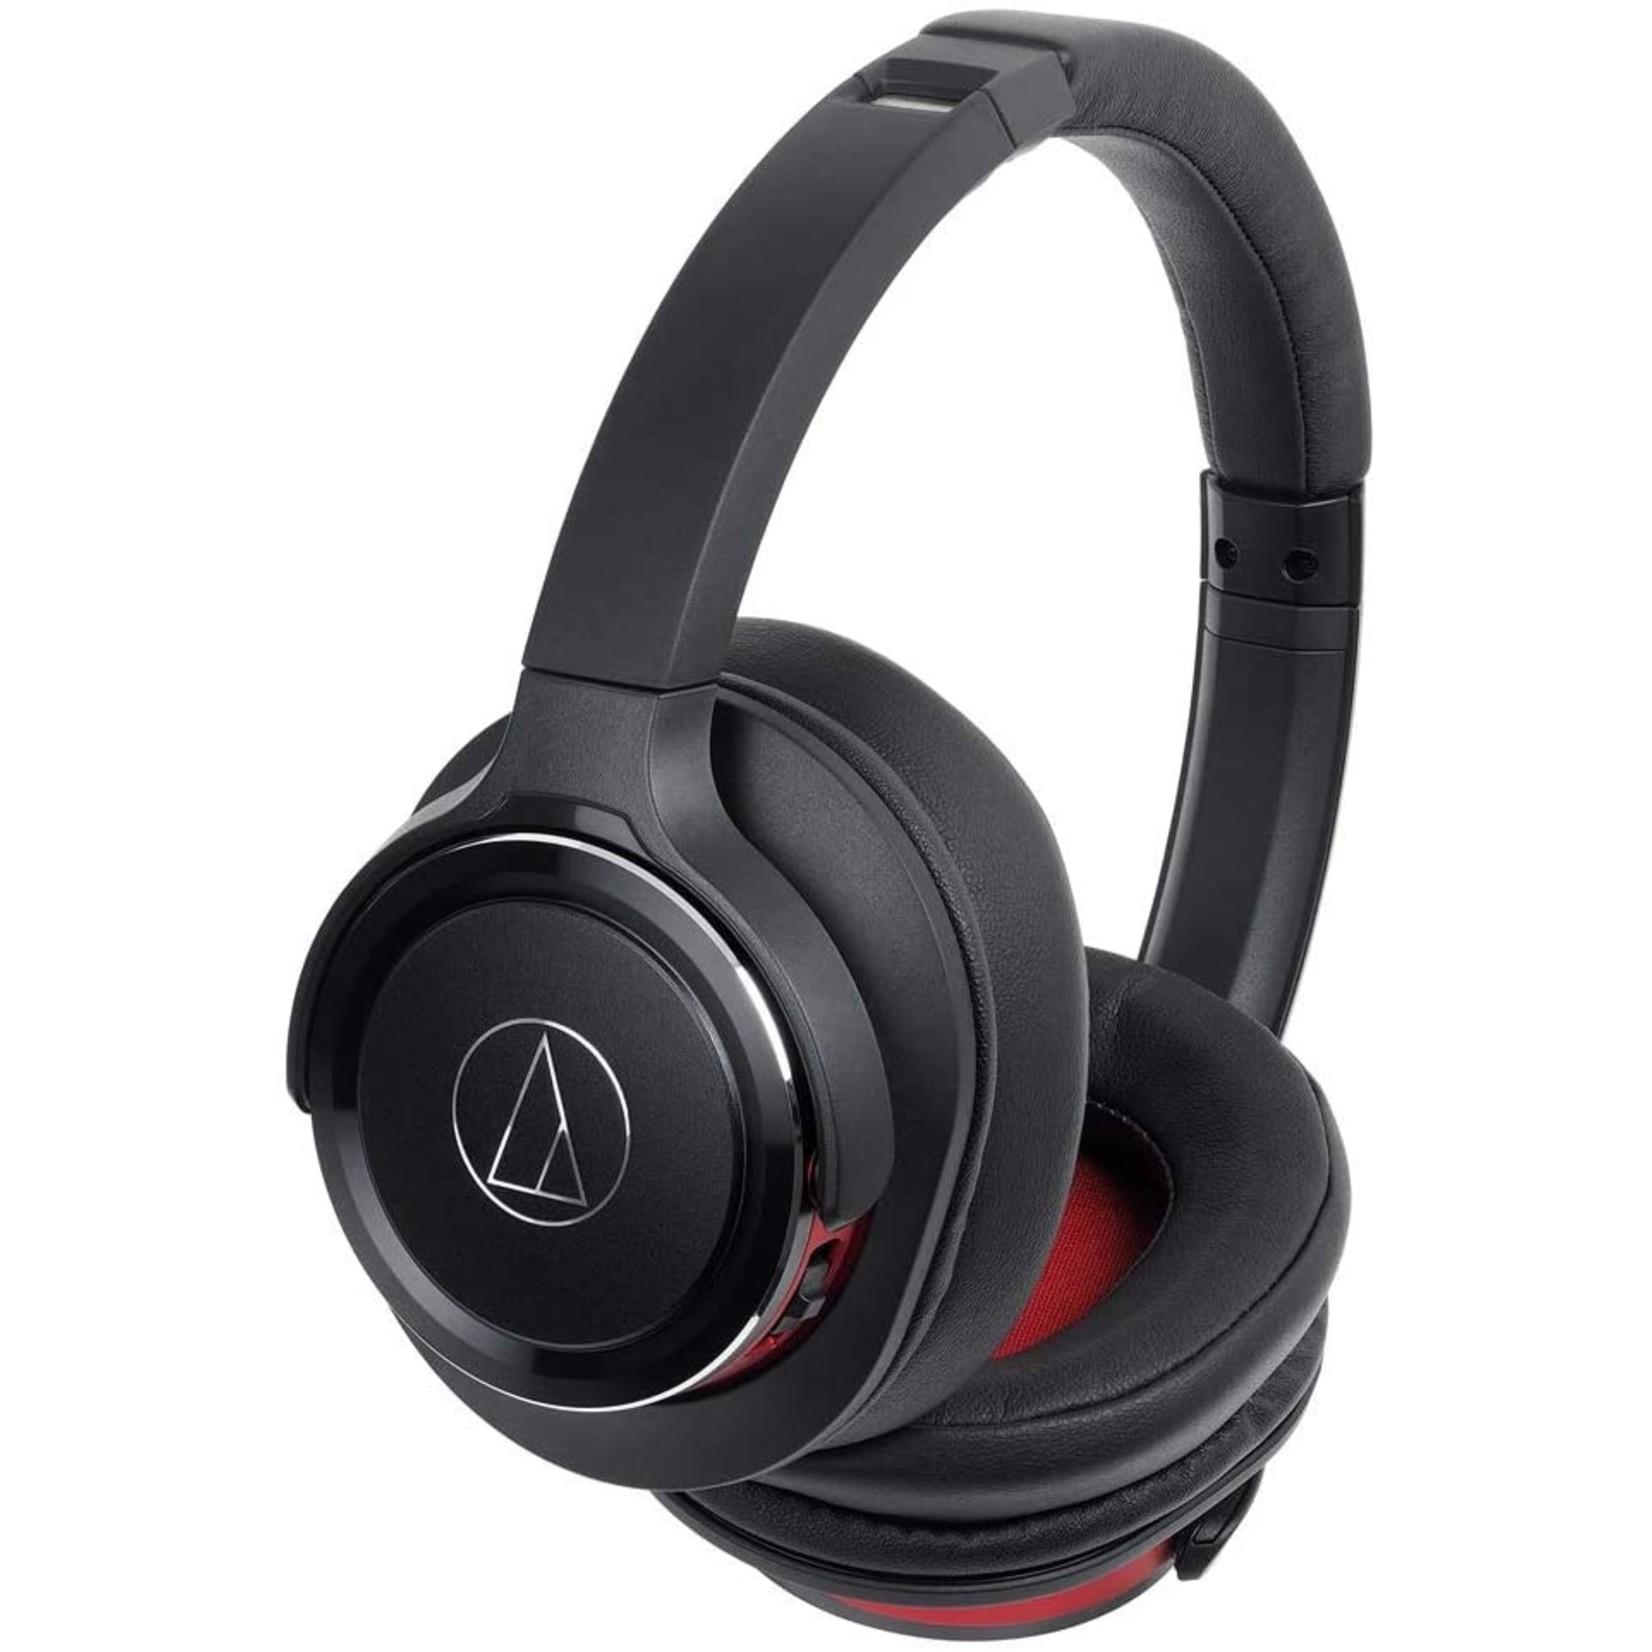 AUDIO-TECHNICA ATH-WS660BTBRD  WIRELESS HEADPHONES